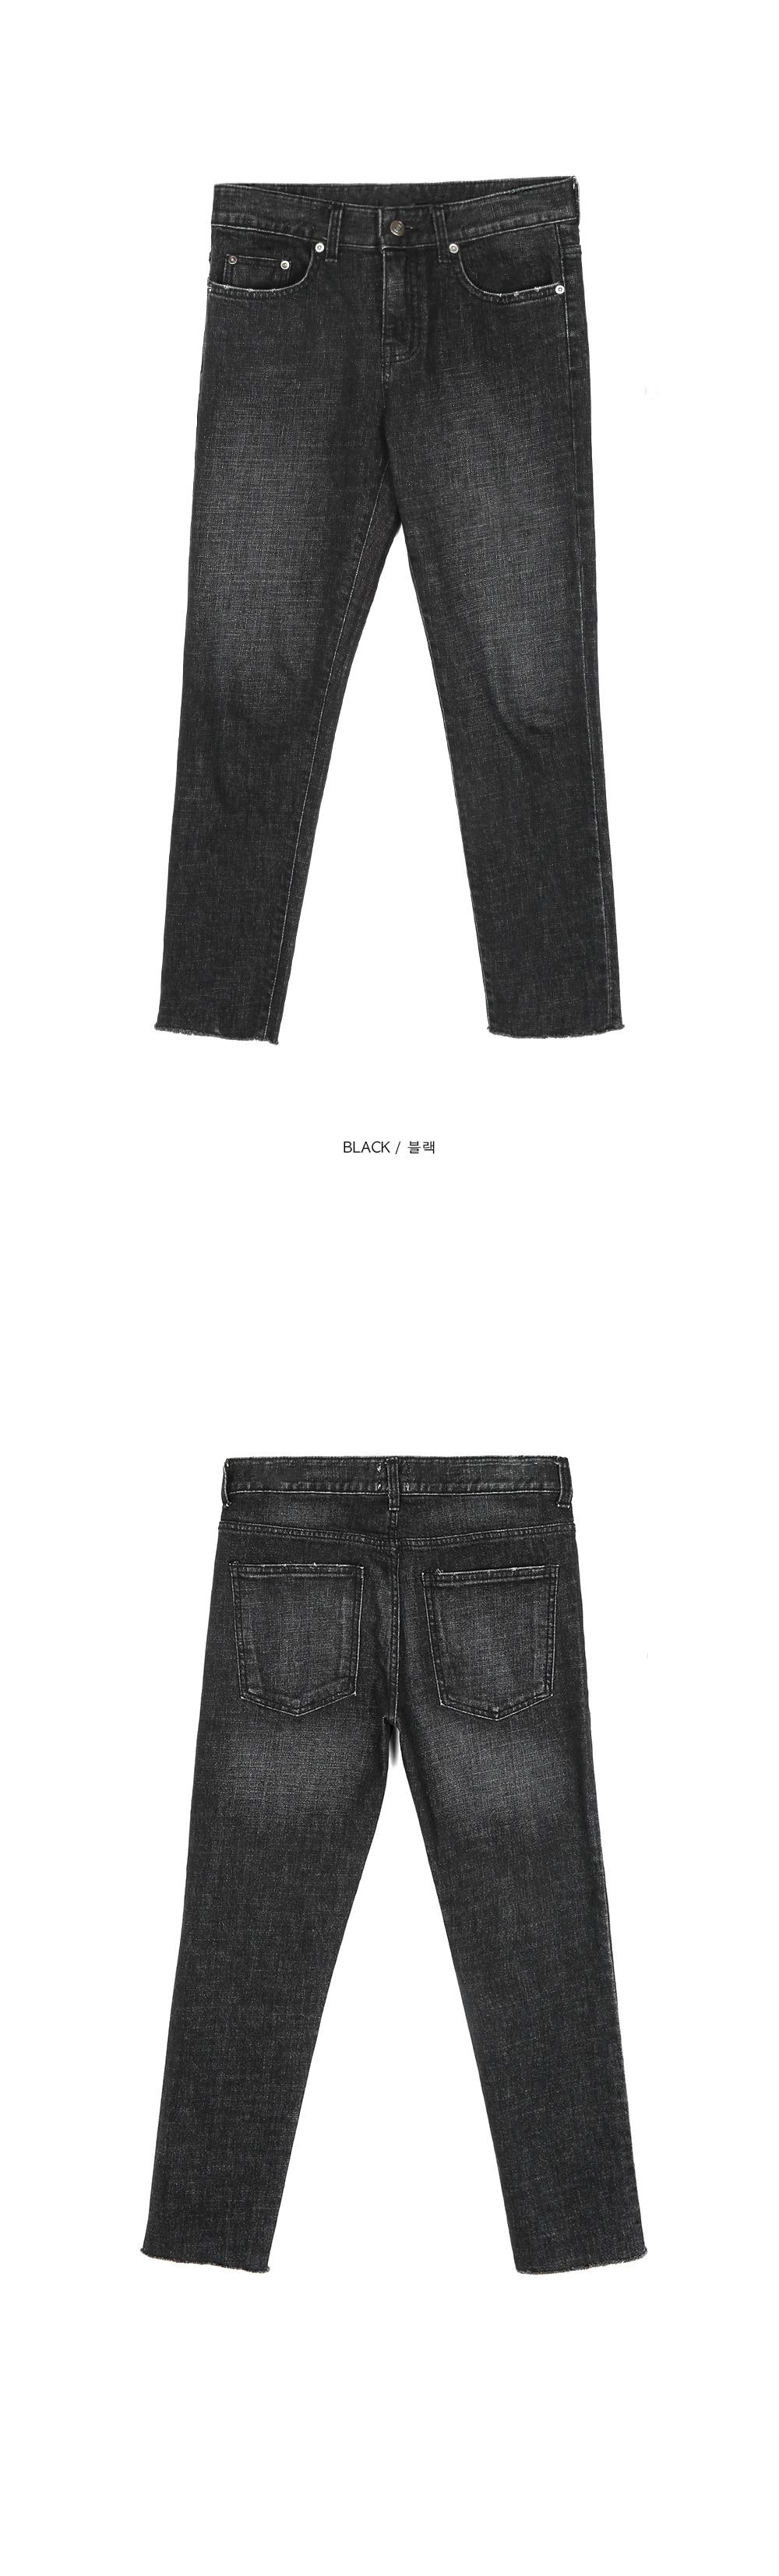 washed slim black jeans - UNISEX